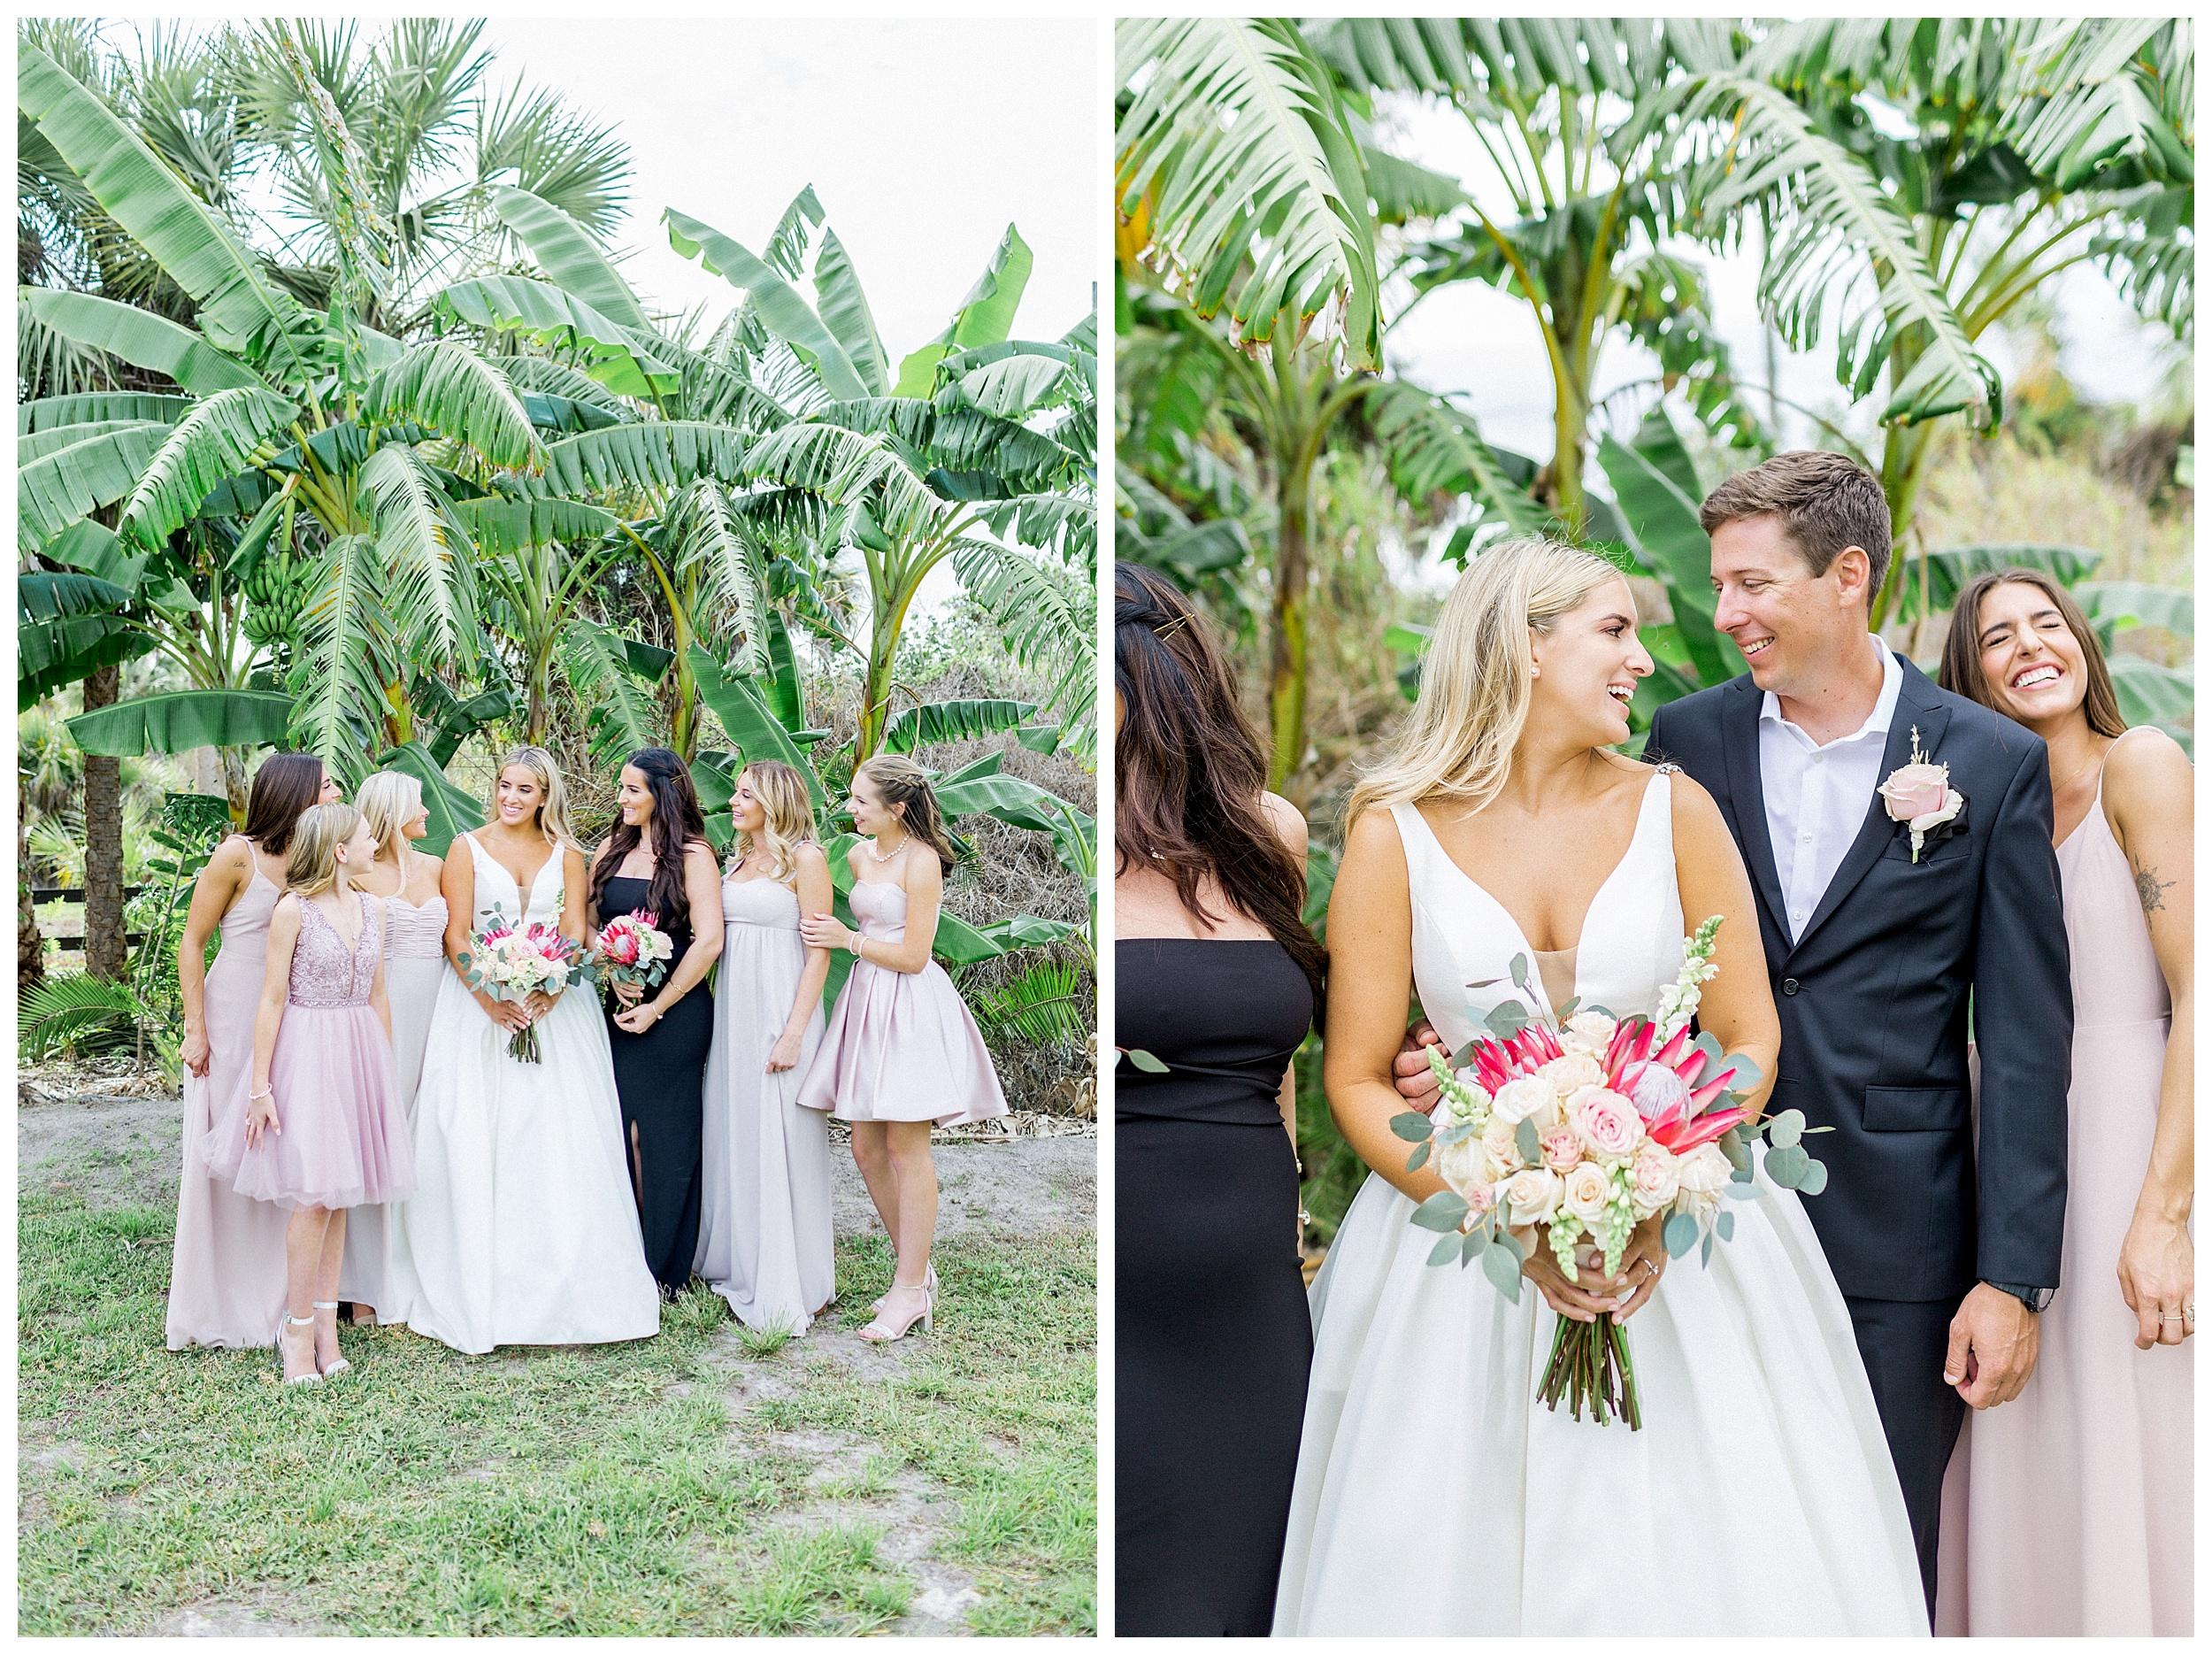 South Florida Wedding Photographer Kir Tuben_0057.jpg